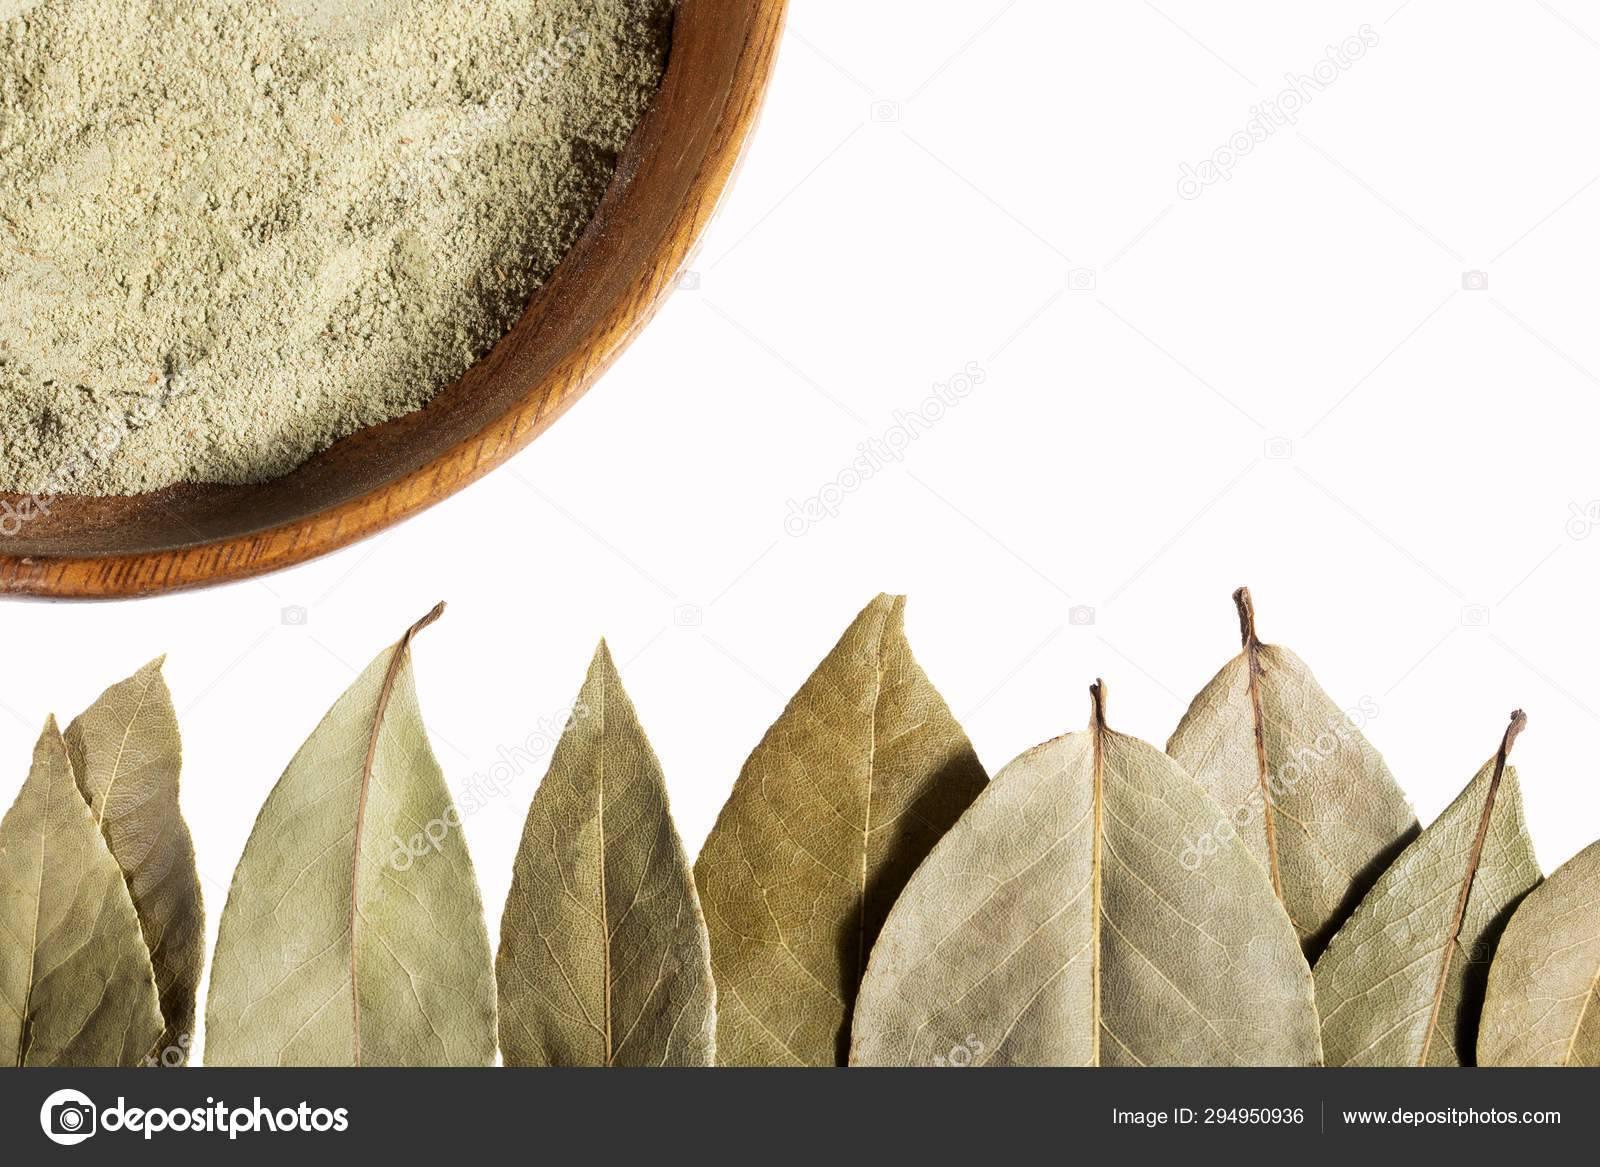 Срок и условия хранения лаврового листа